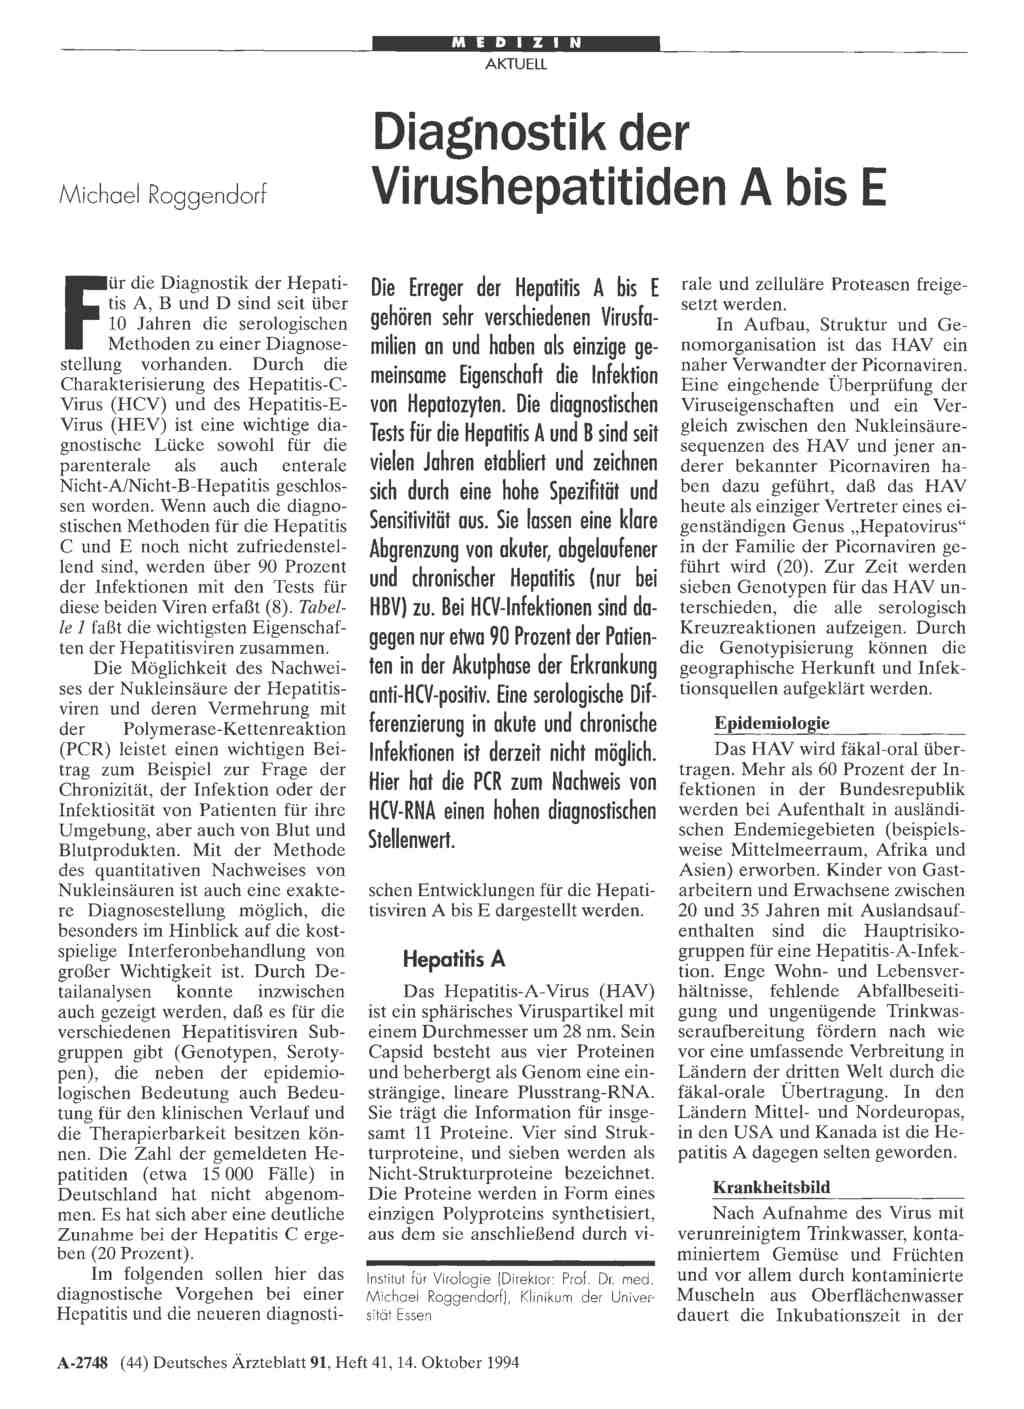 Child welfare : historical dimensions, contemporary debates 2003